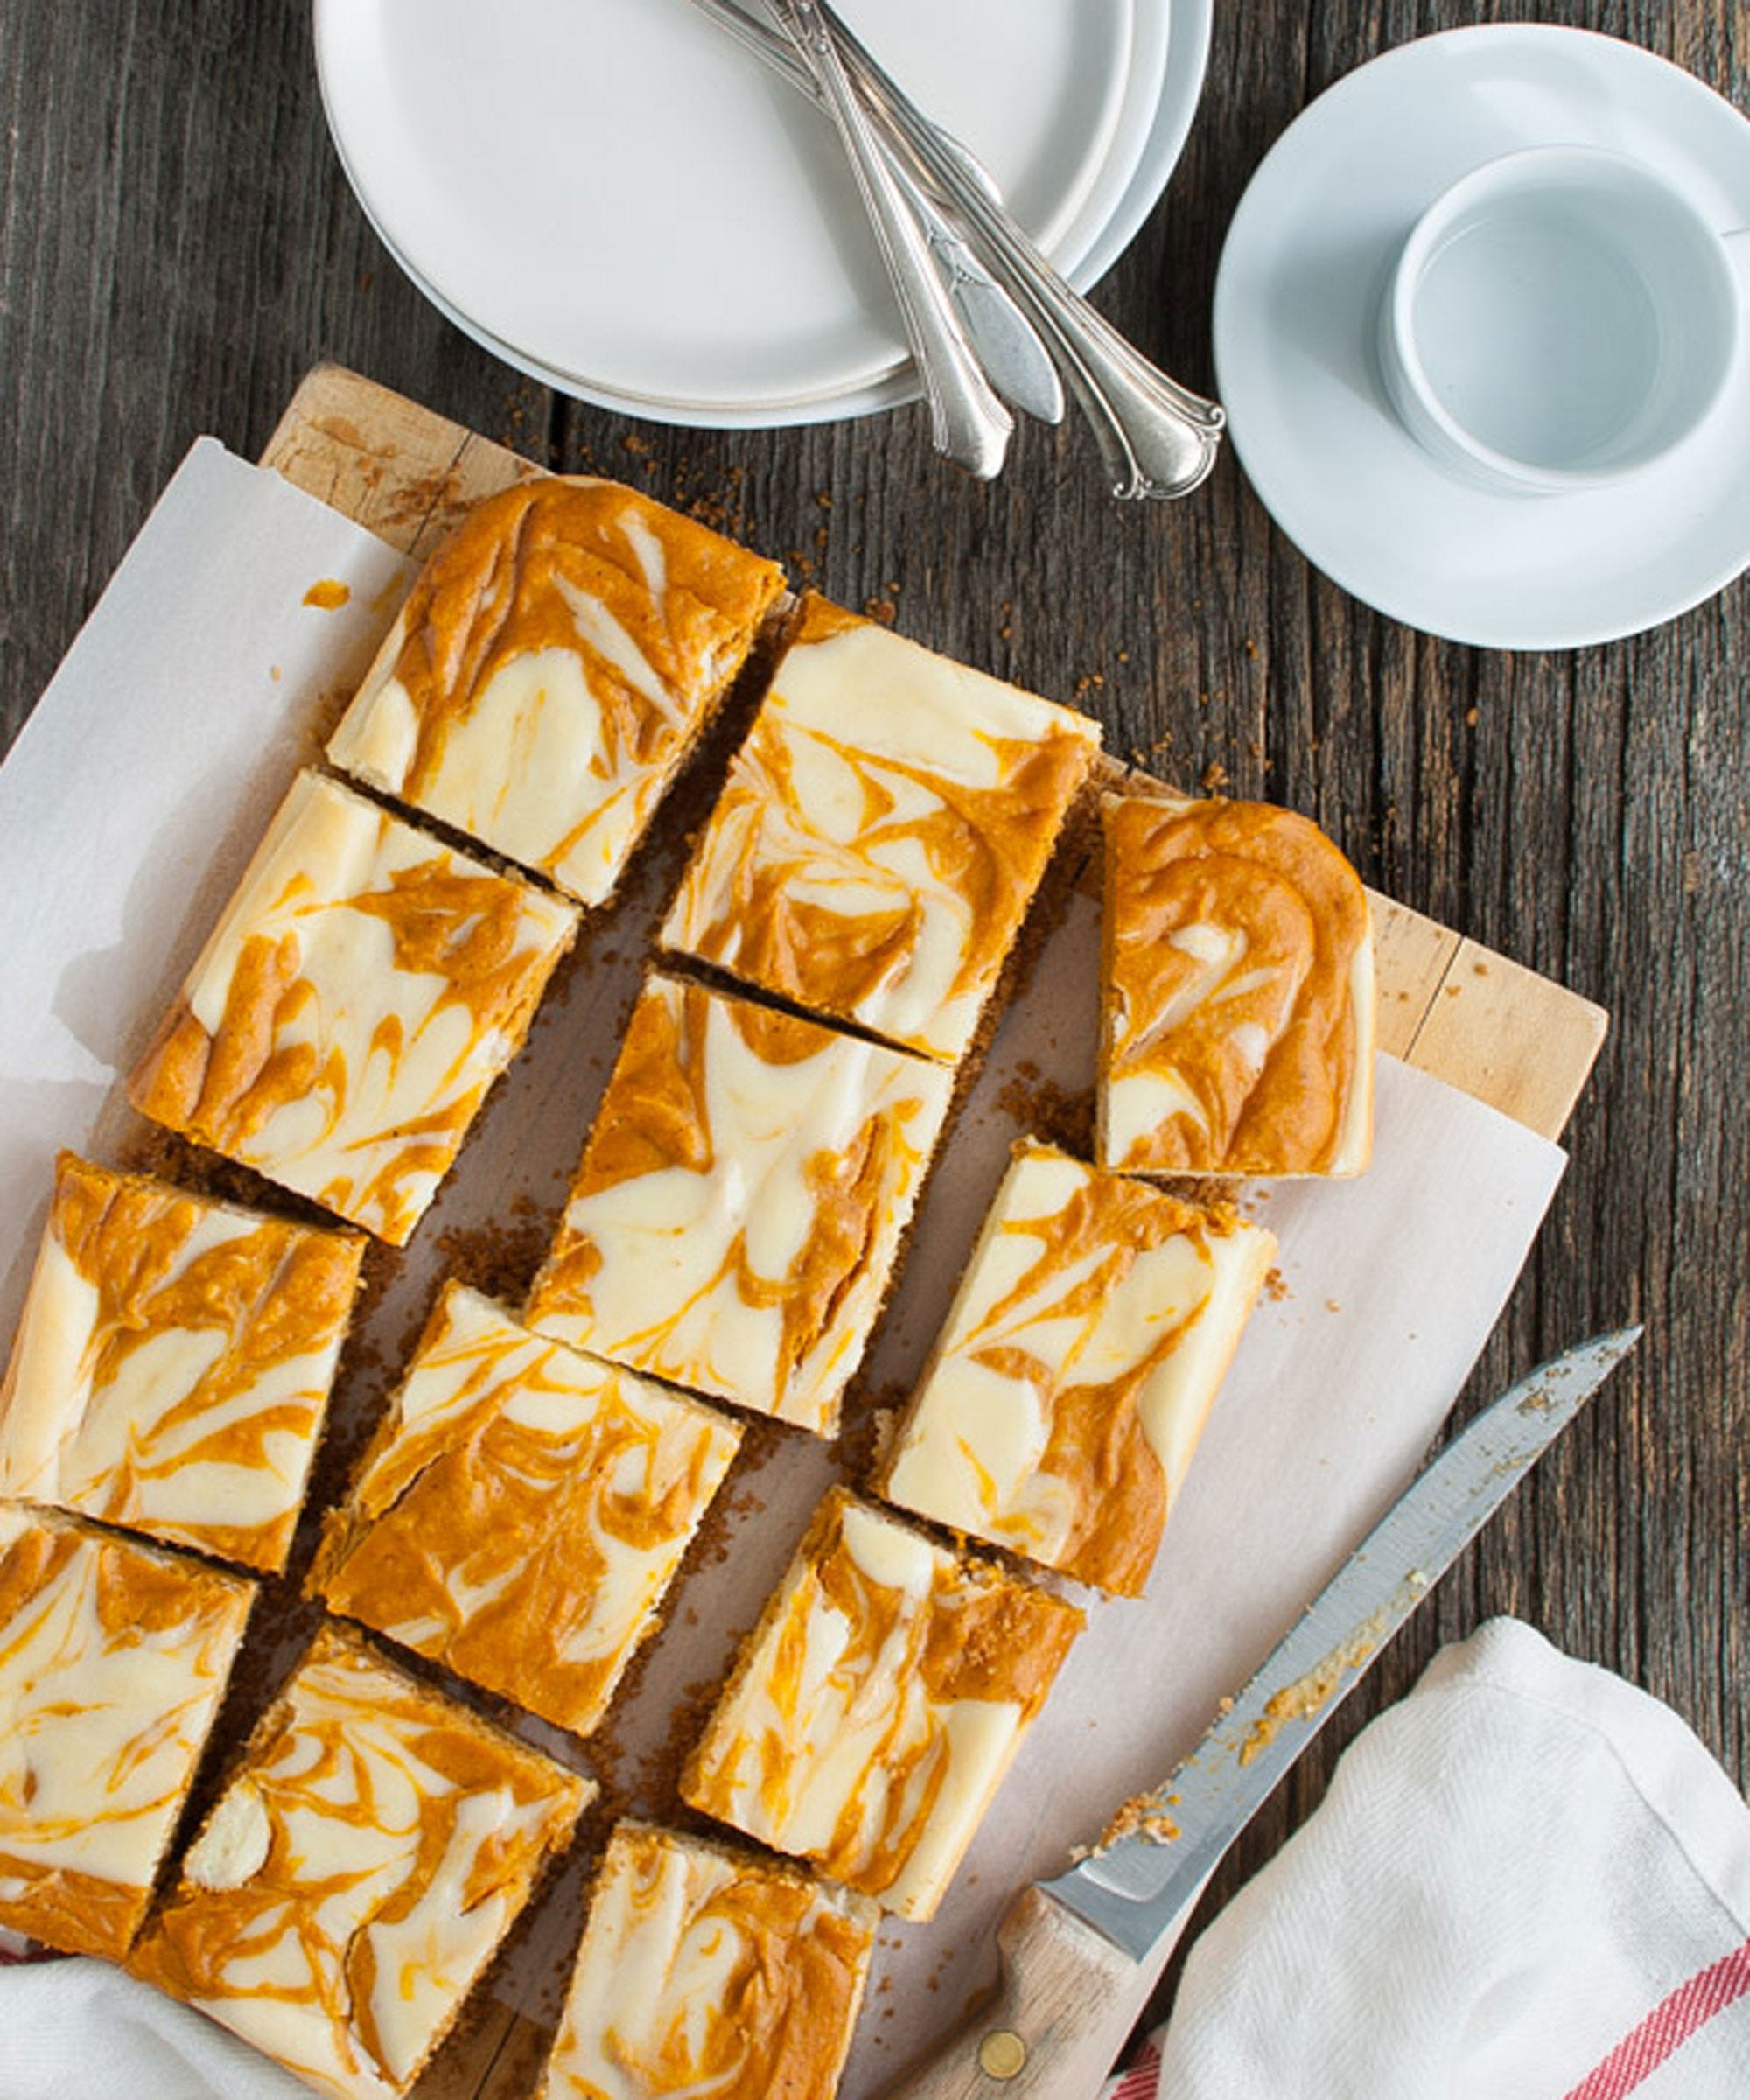 10 Next-Level Pumpkin Cheesecake Recipes